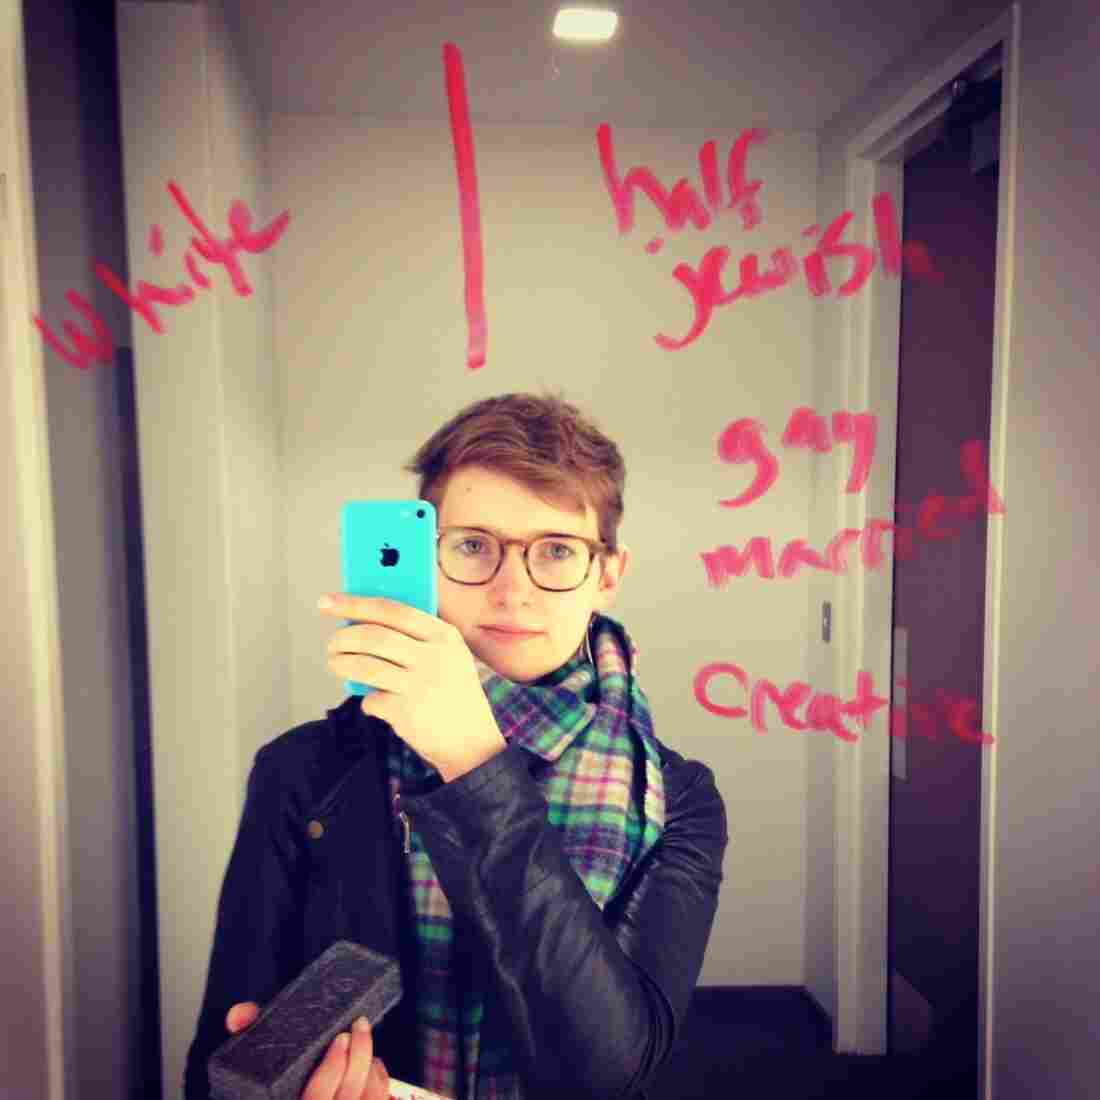 Selena Simmons-Duffin, NPR Producer, 28, Washington, D.C.  Standard Census: #white. #nprcensus: #halfjewish #gaymarried #creative